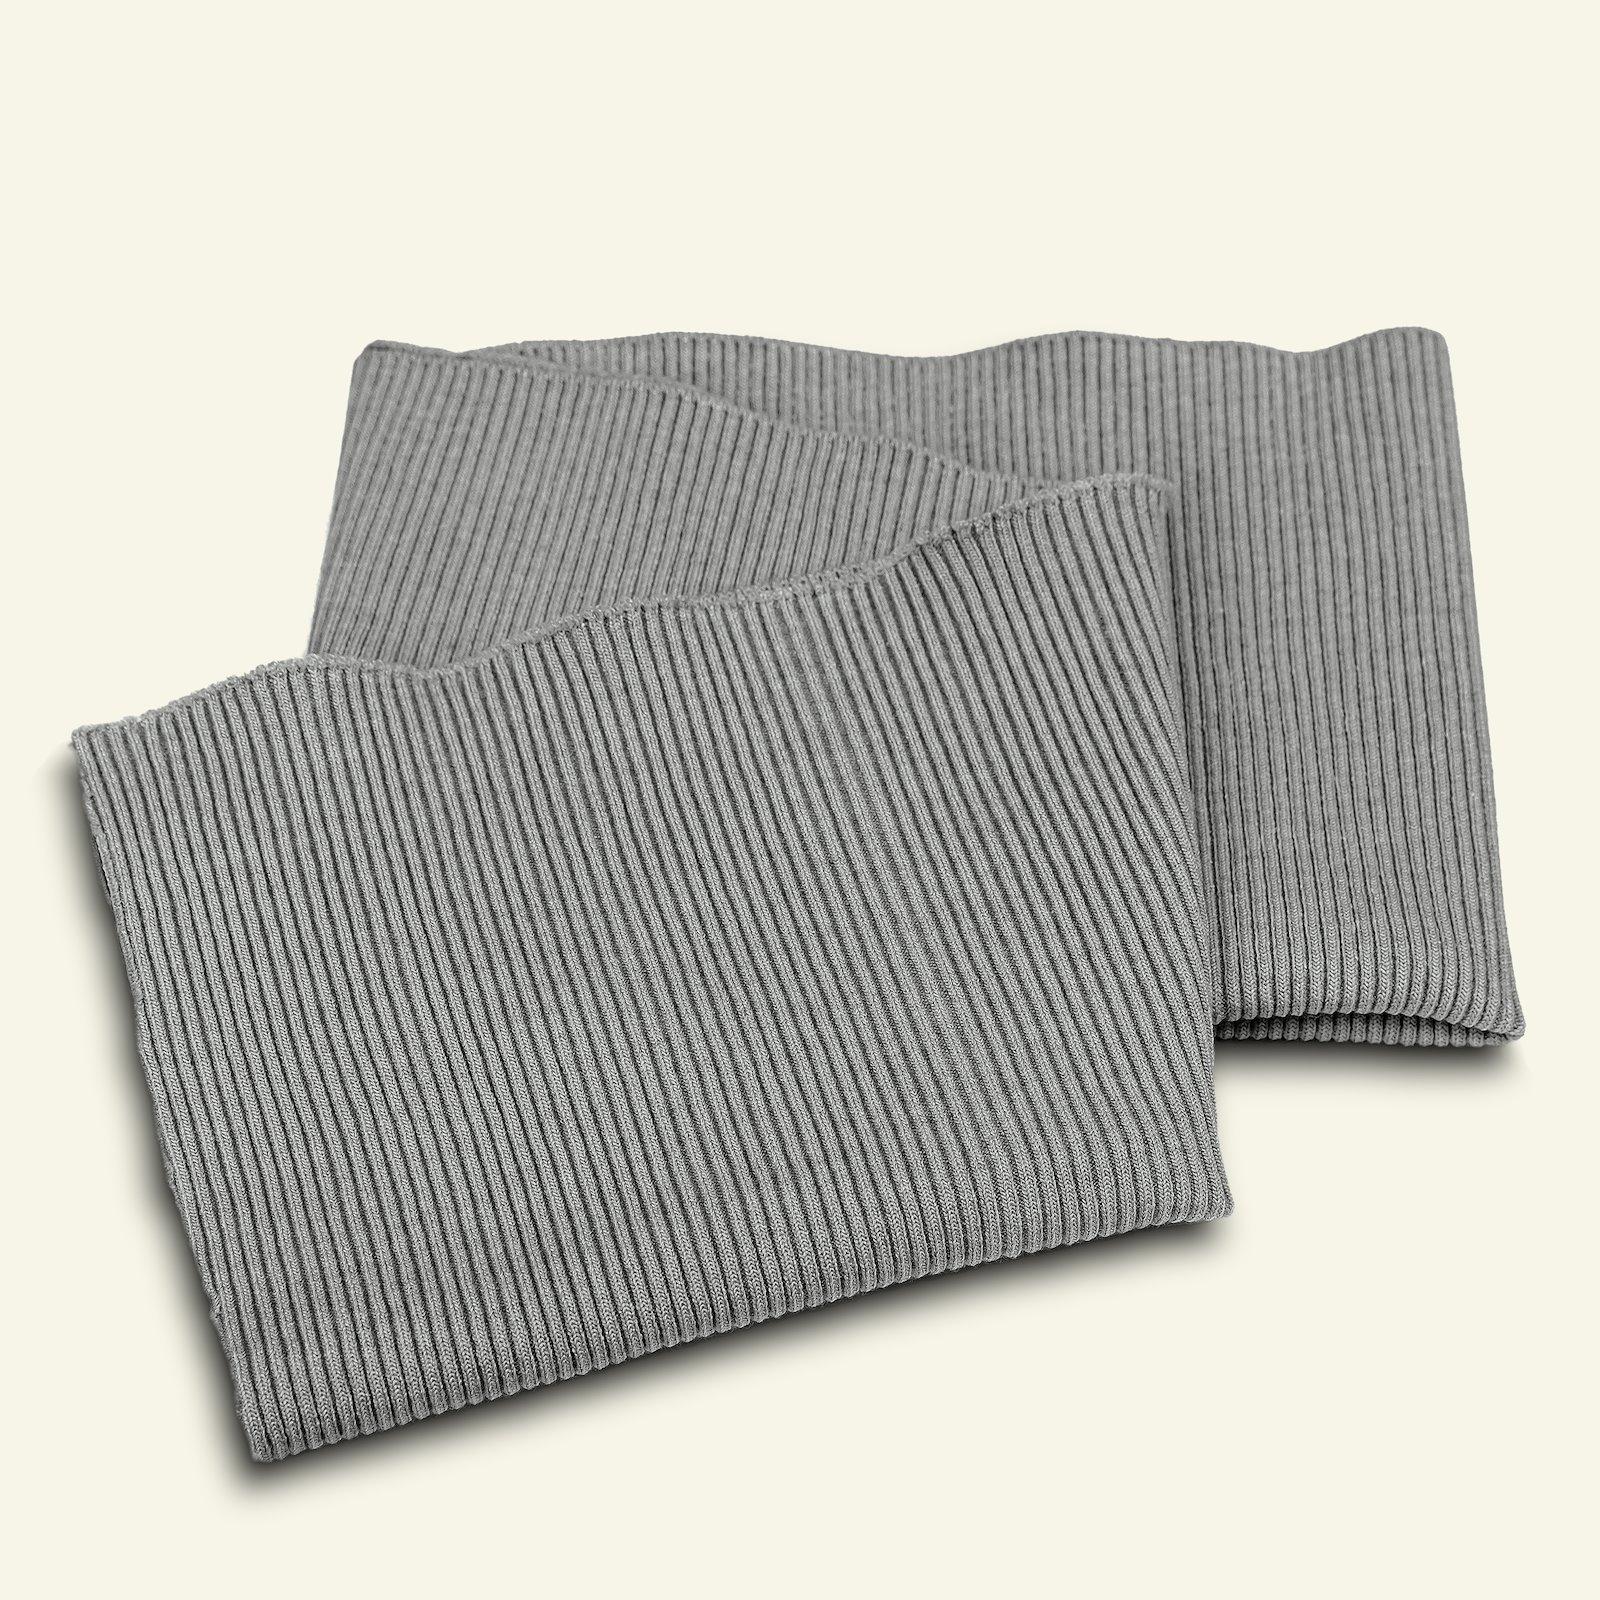 Rib 2x2 30x90cm grey melange 1pc 96041_pack